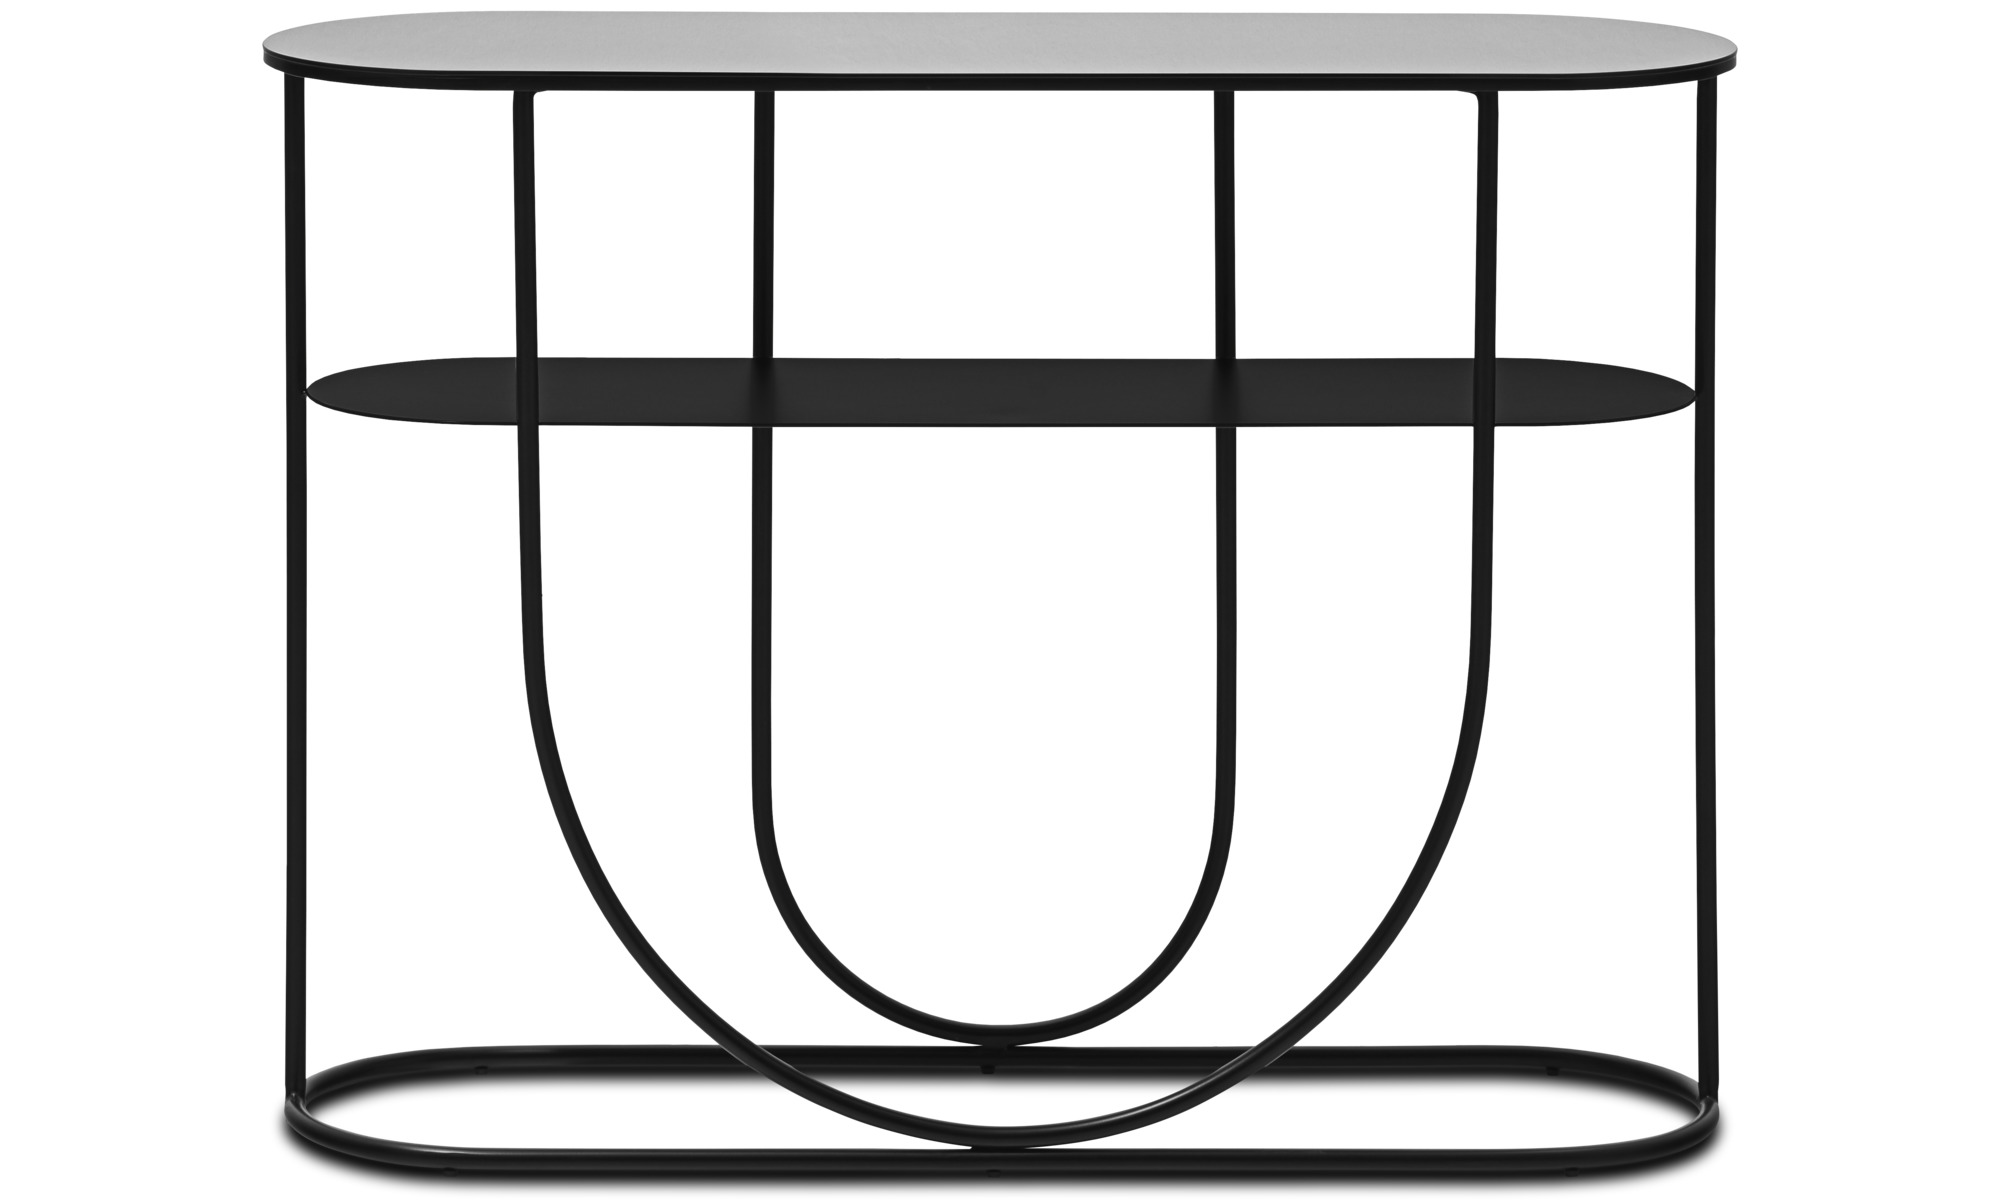 Hallmöbler - Aisle konsolbord - oval - Svart - Metall